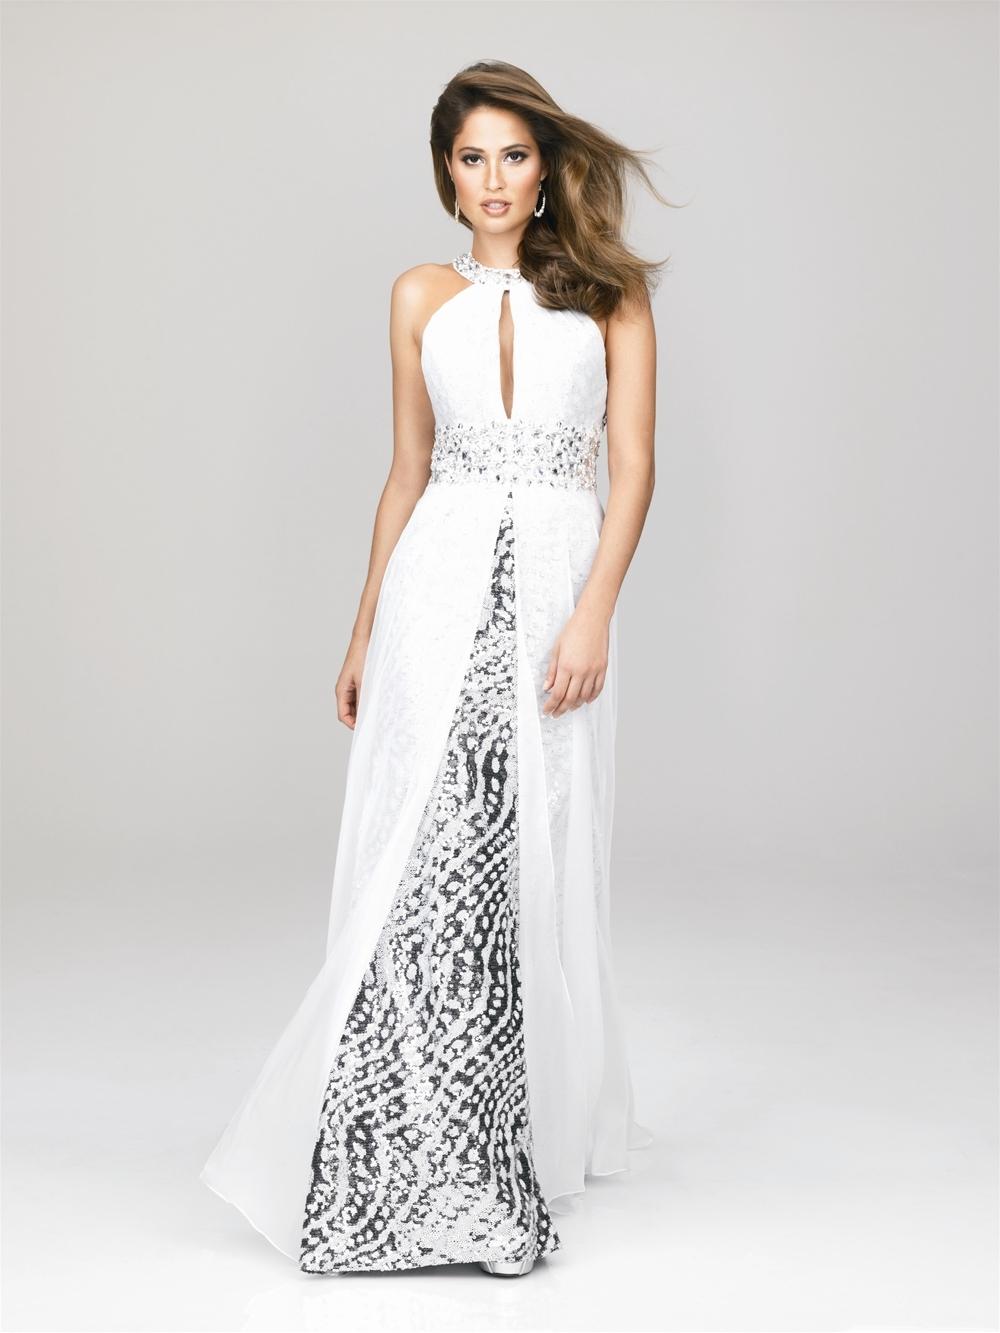 Платья вечерние напрокат в сочи